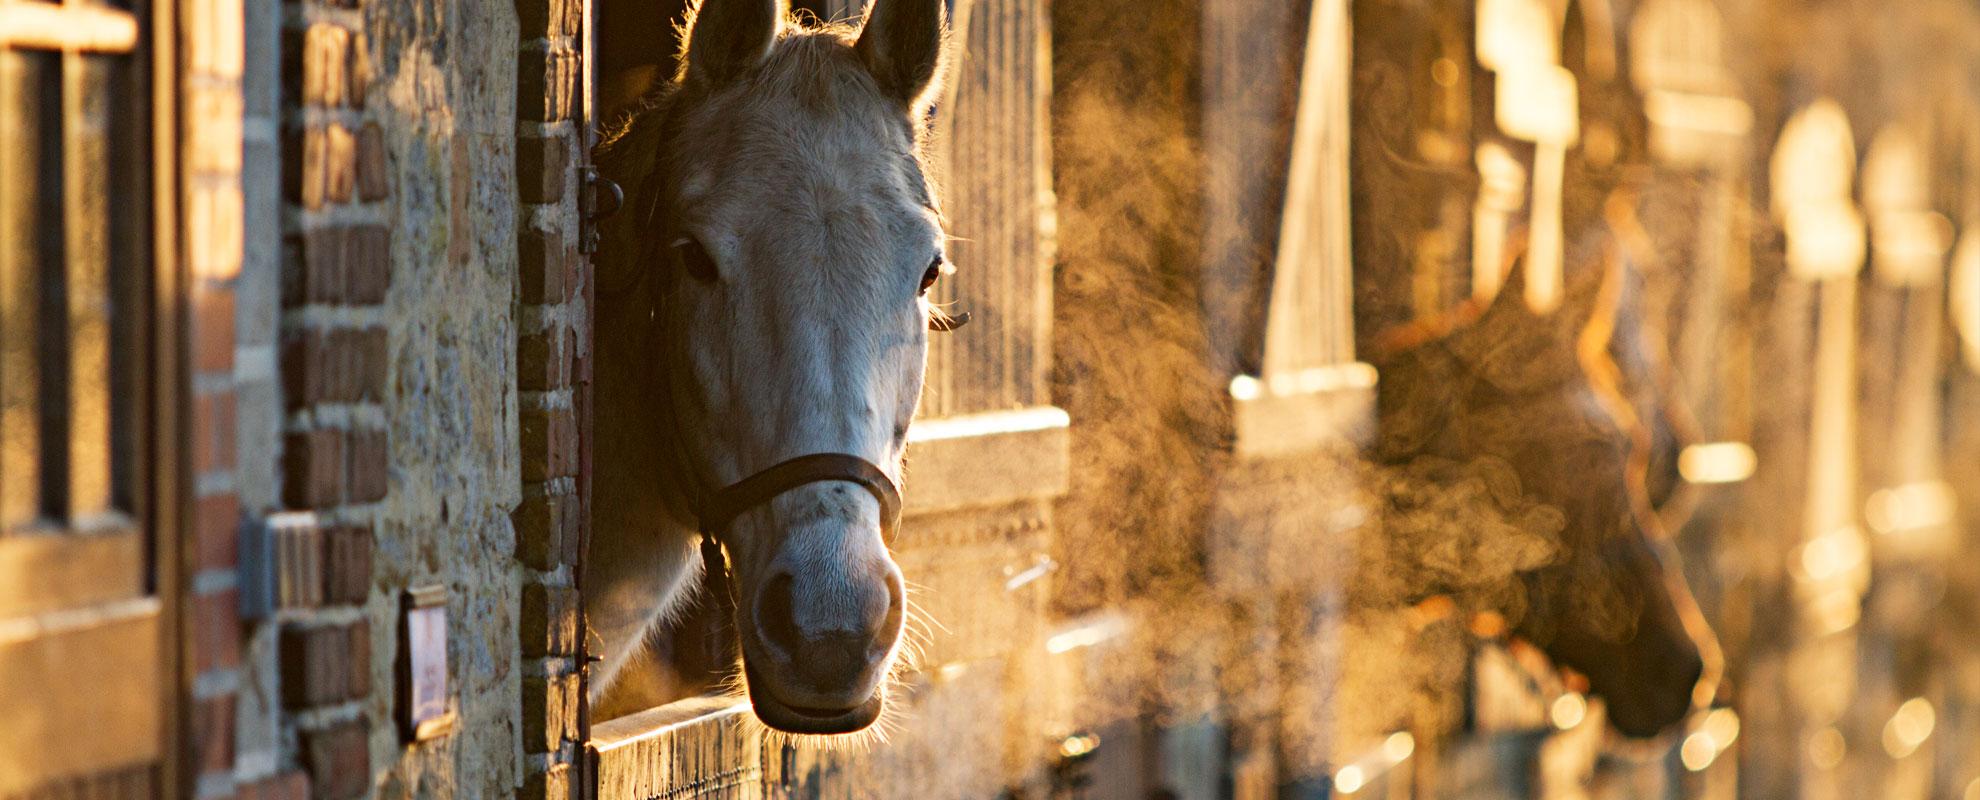 horses_mares_main_002-opt